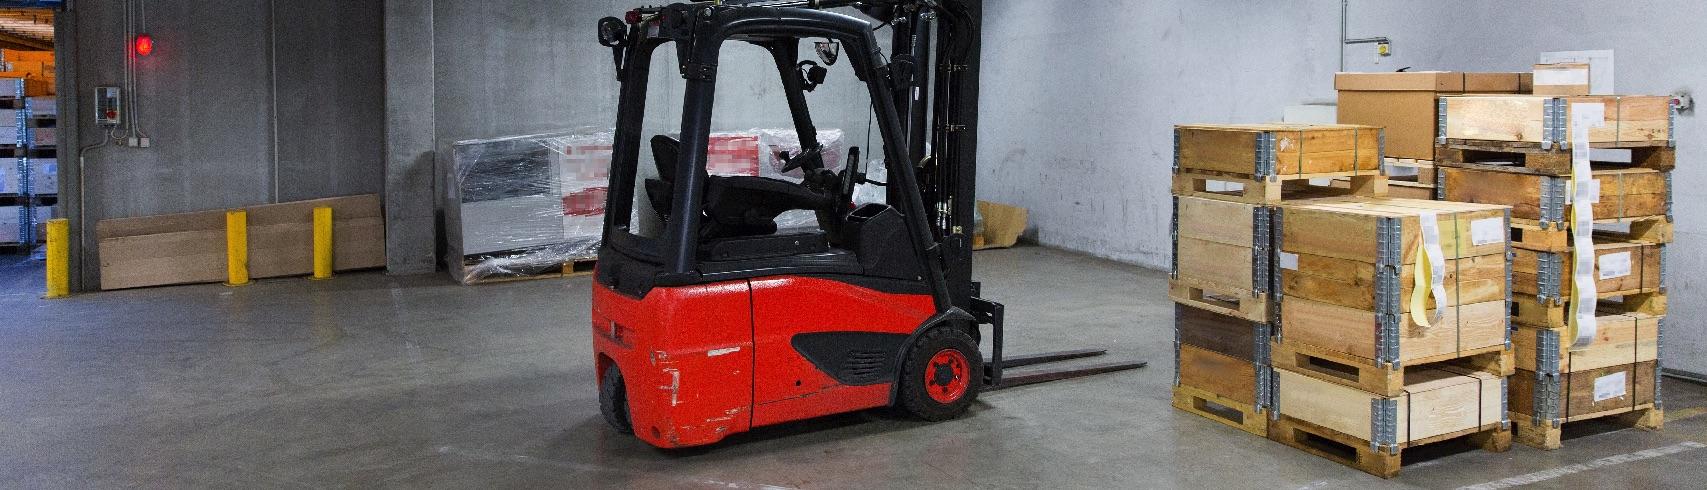 Forklift Rental Los Angeles CA - Tobly Equipment Rental